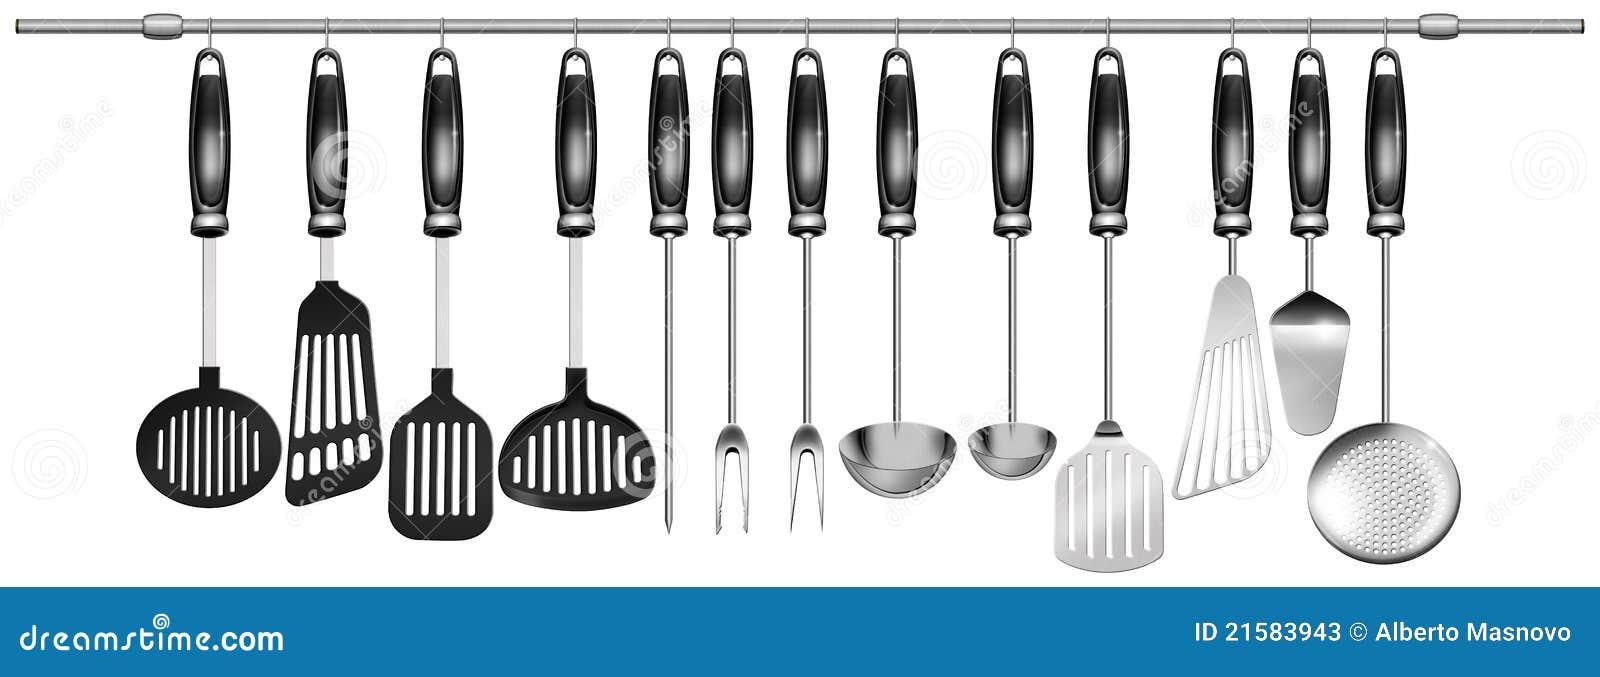 Horizontal Set Kitchen Utensils Stock Photos - Image: 21583943